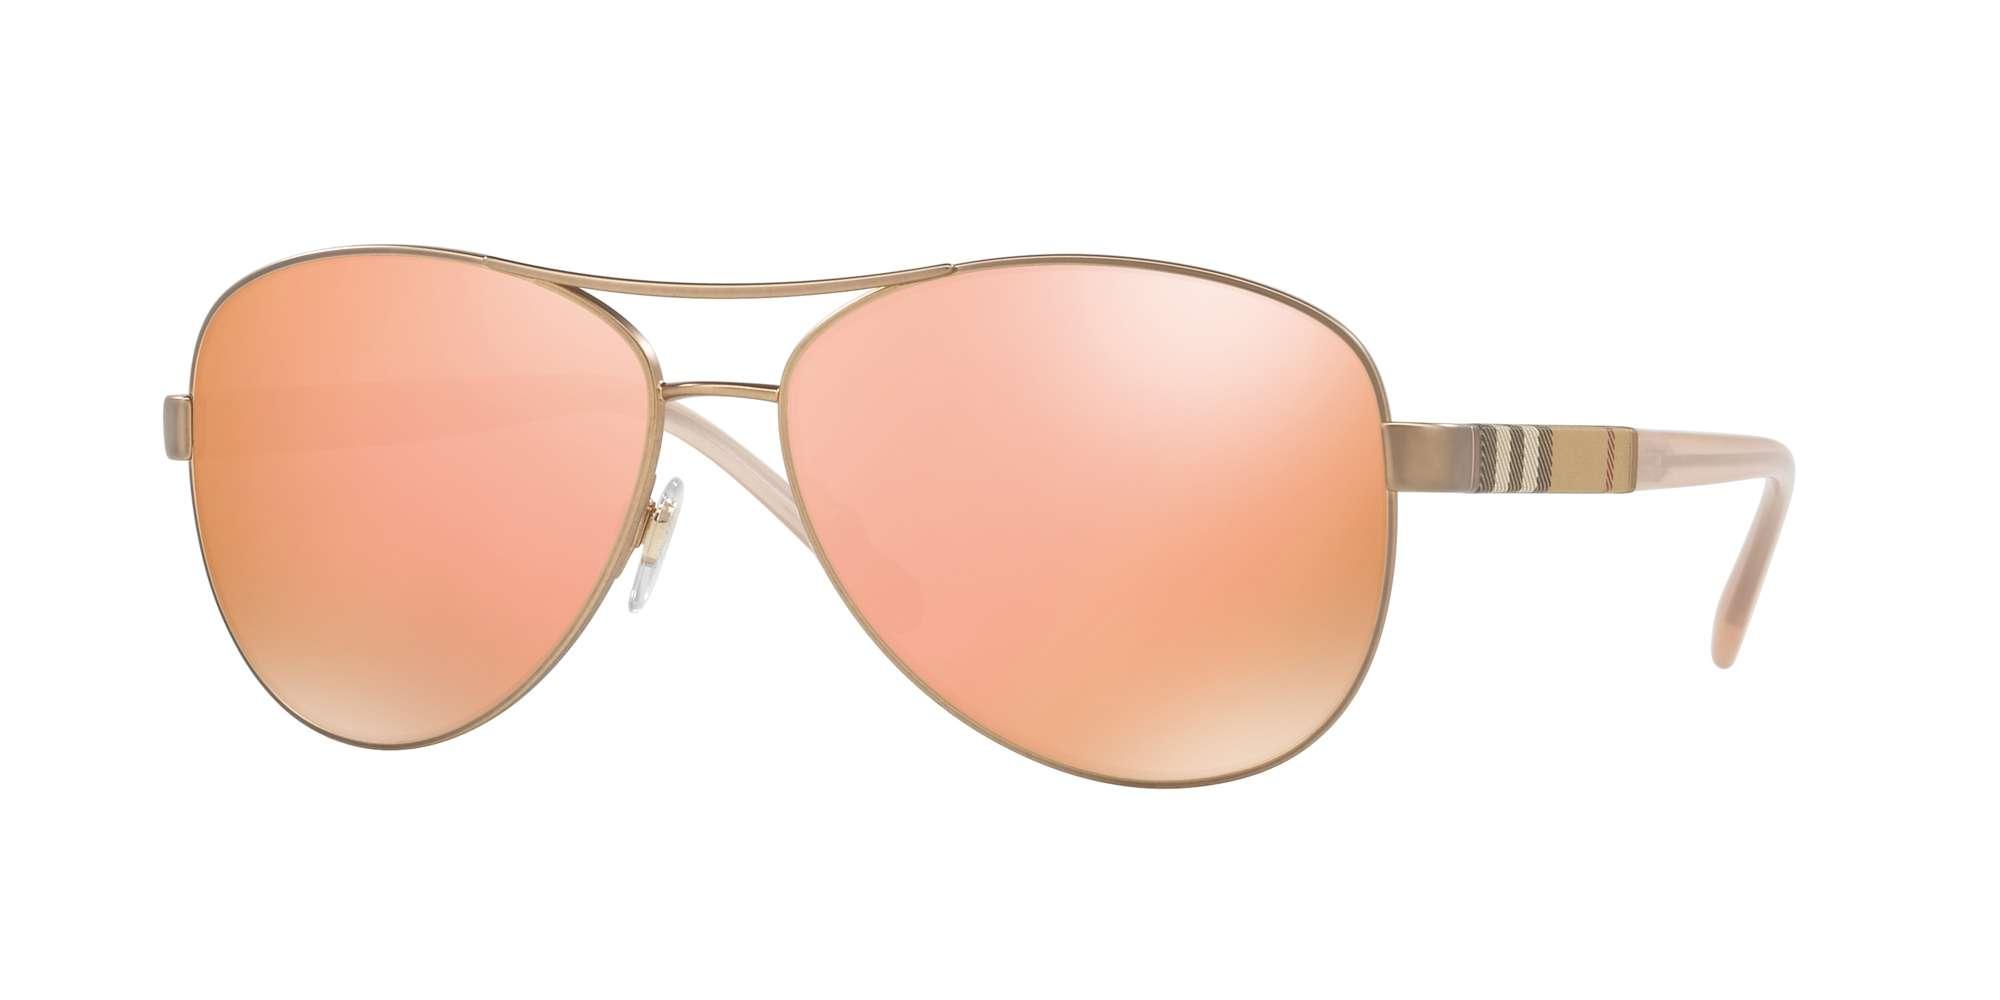 MATTE GOLD / BROWN MIRROR ROSE GOLD lenses